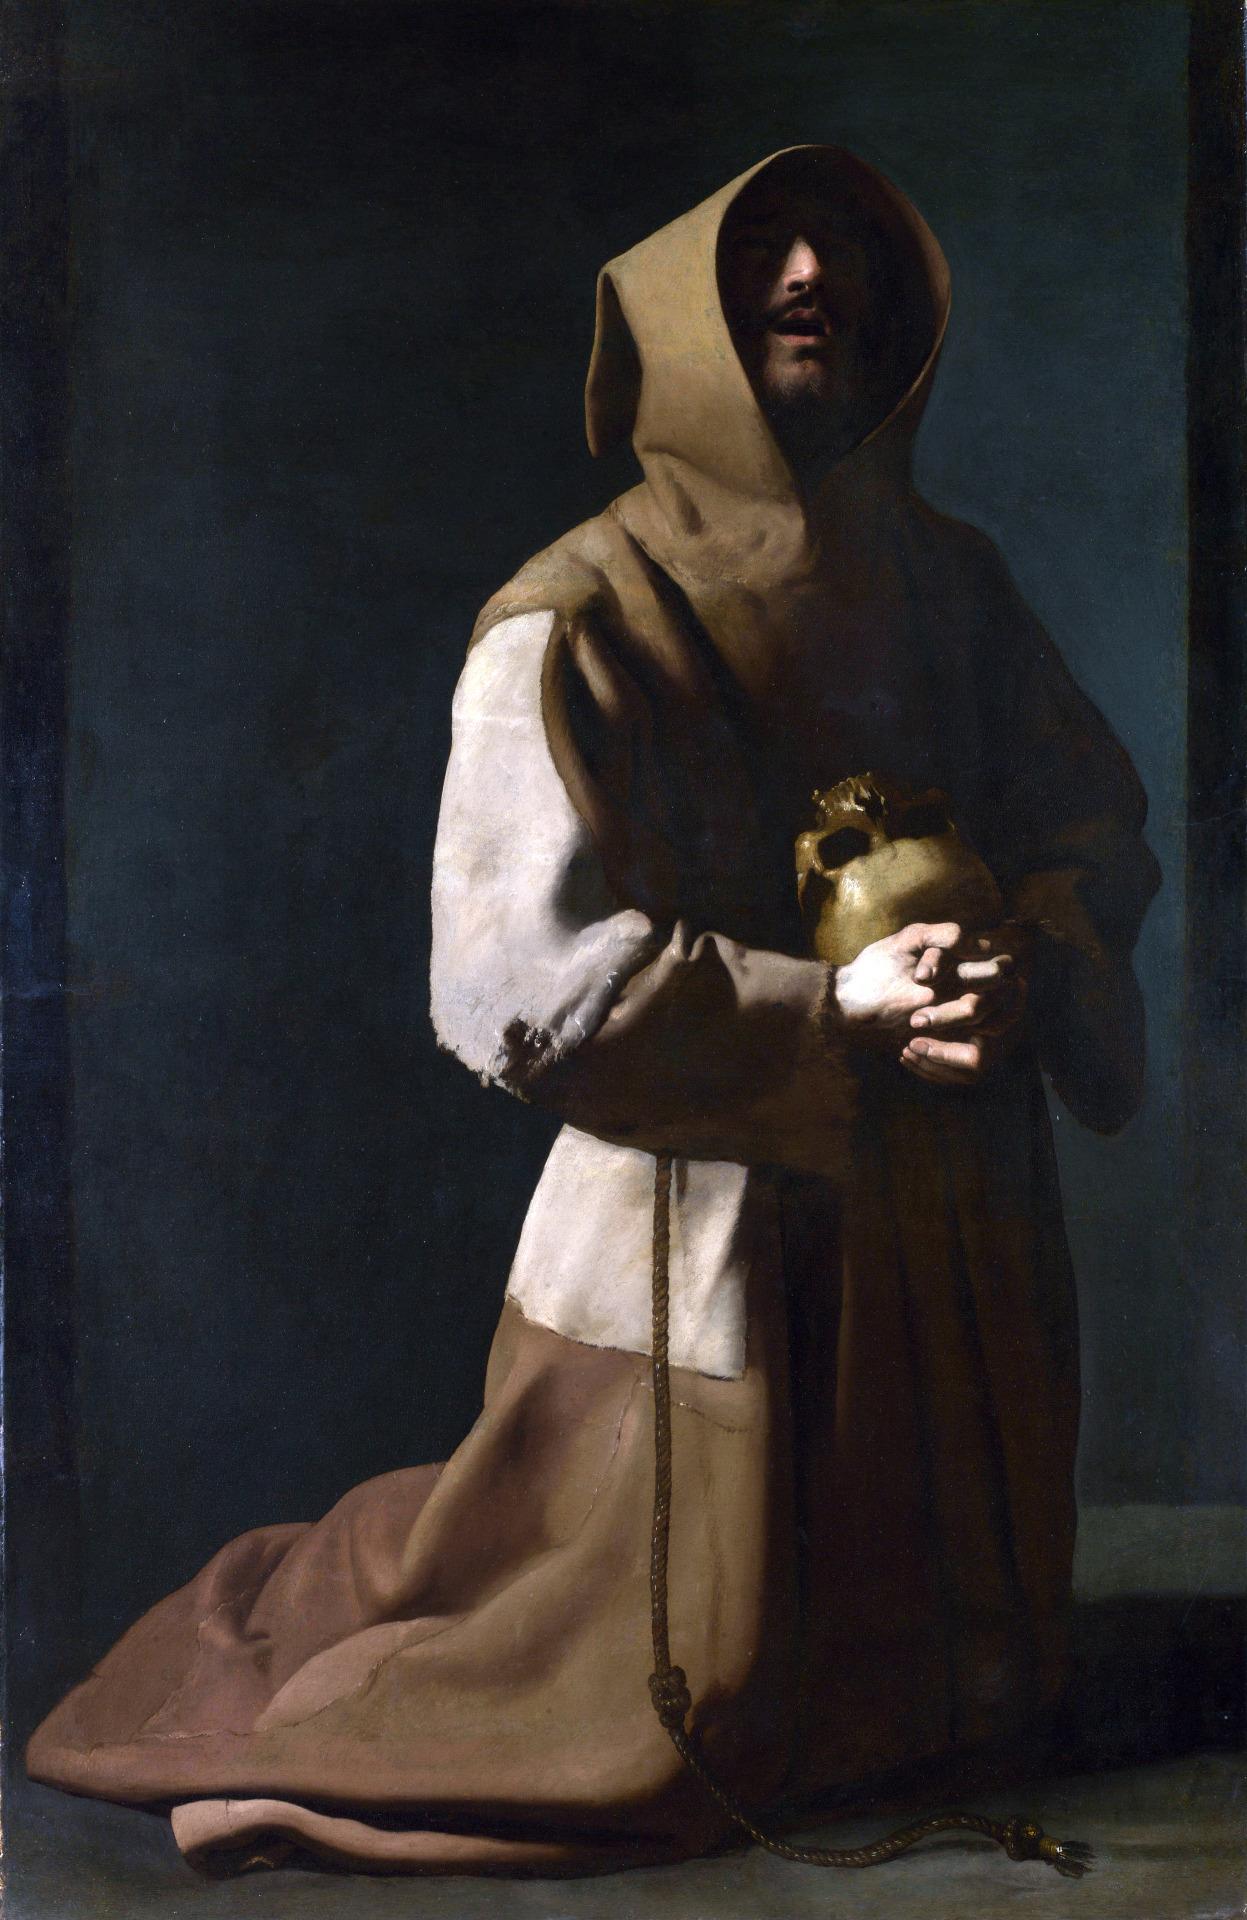 Francisco de Zurbaràn San Francesco in meditazione (1635-39), National Gallery, Londra